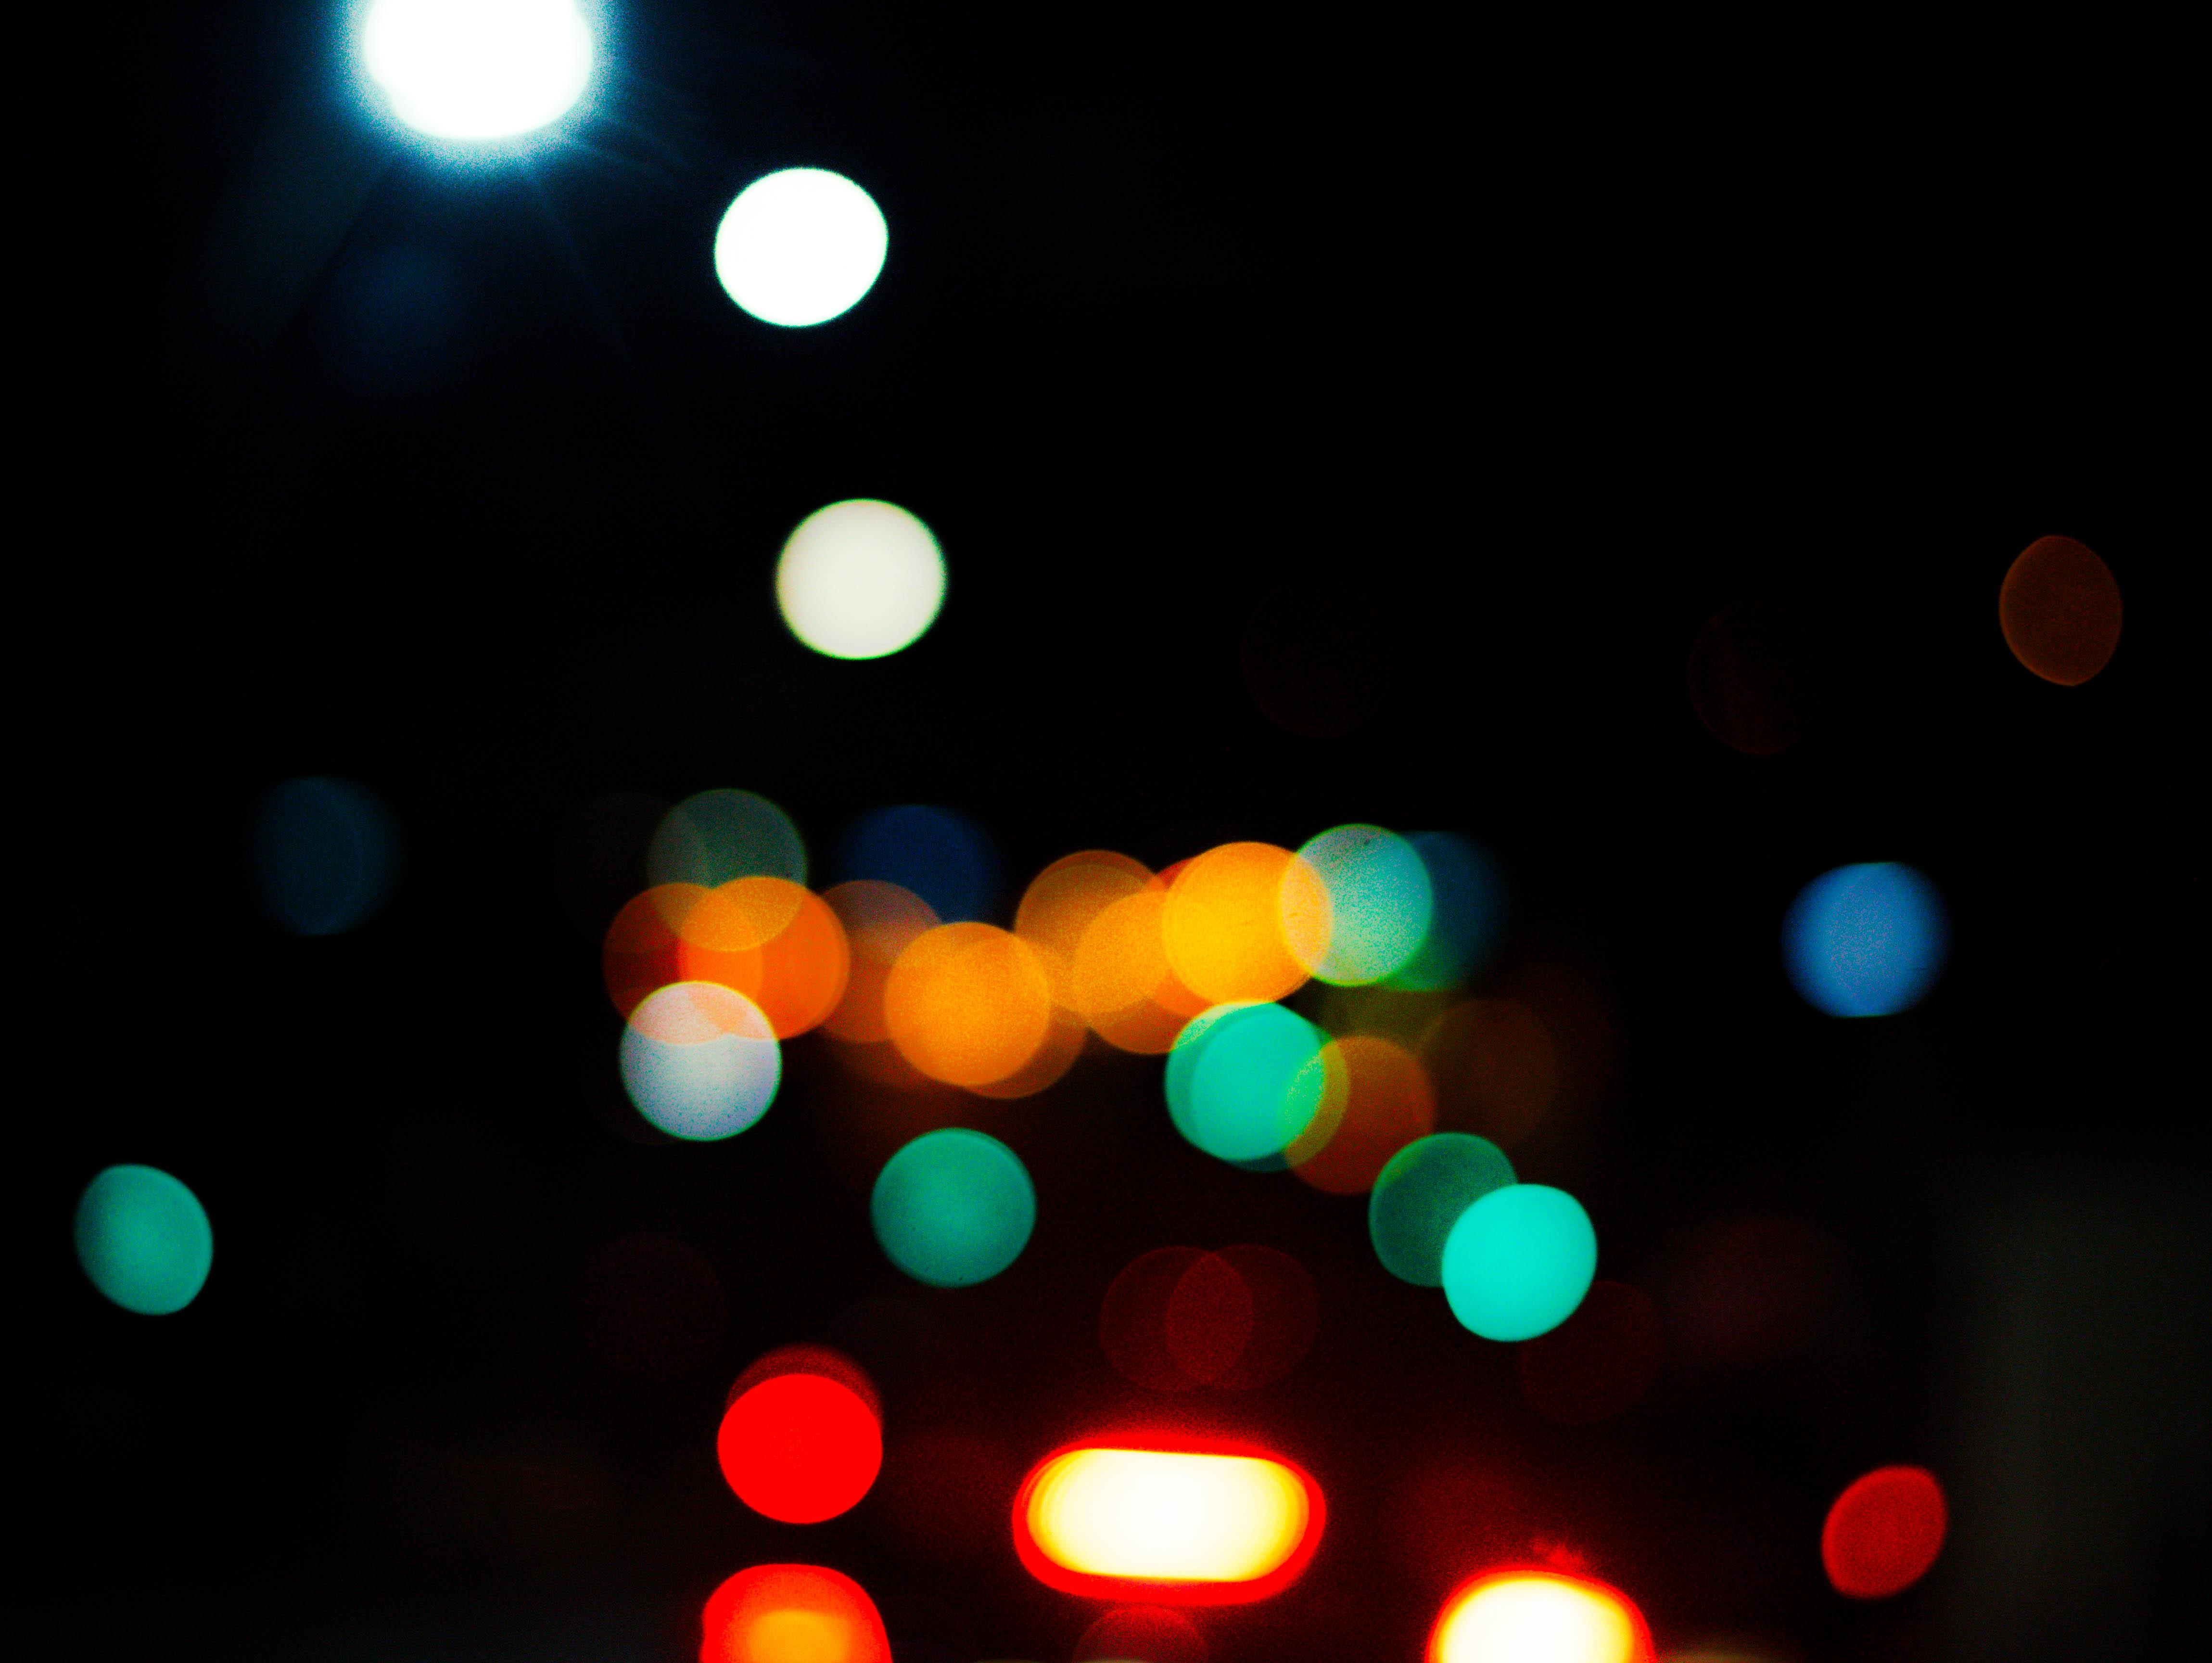 Free stock photo of blur, blurry, bokeh